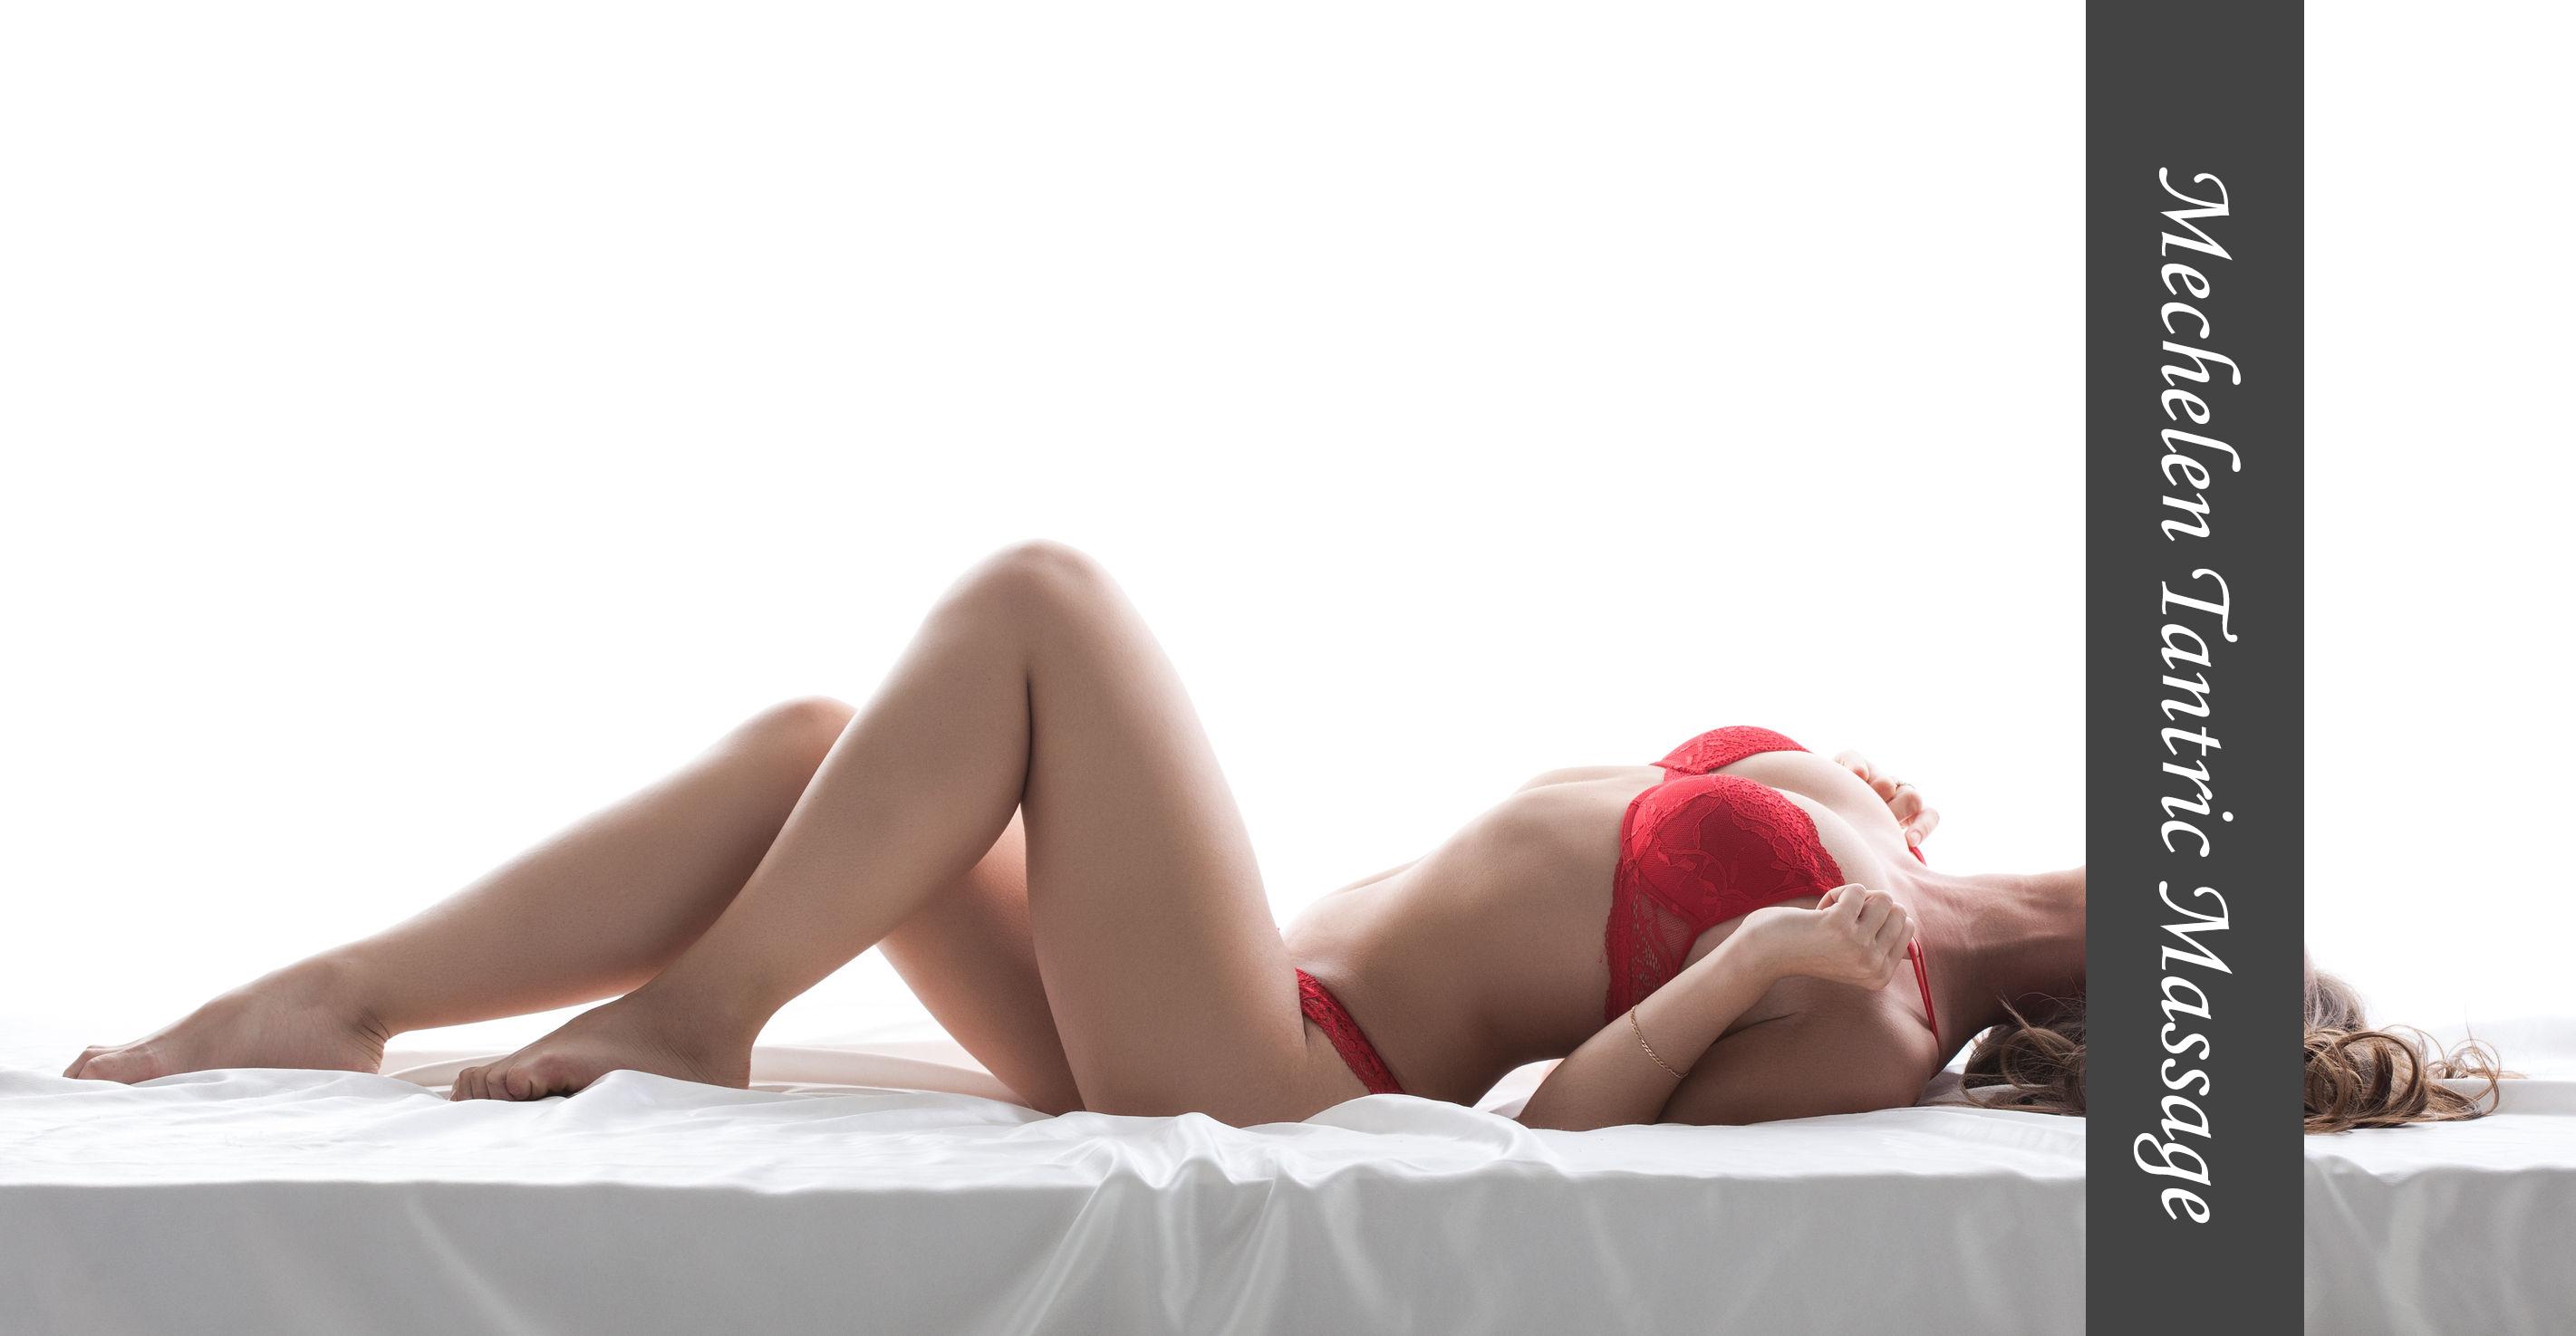 30743688 - image of excited slim model posing lying in red lingerie